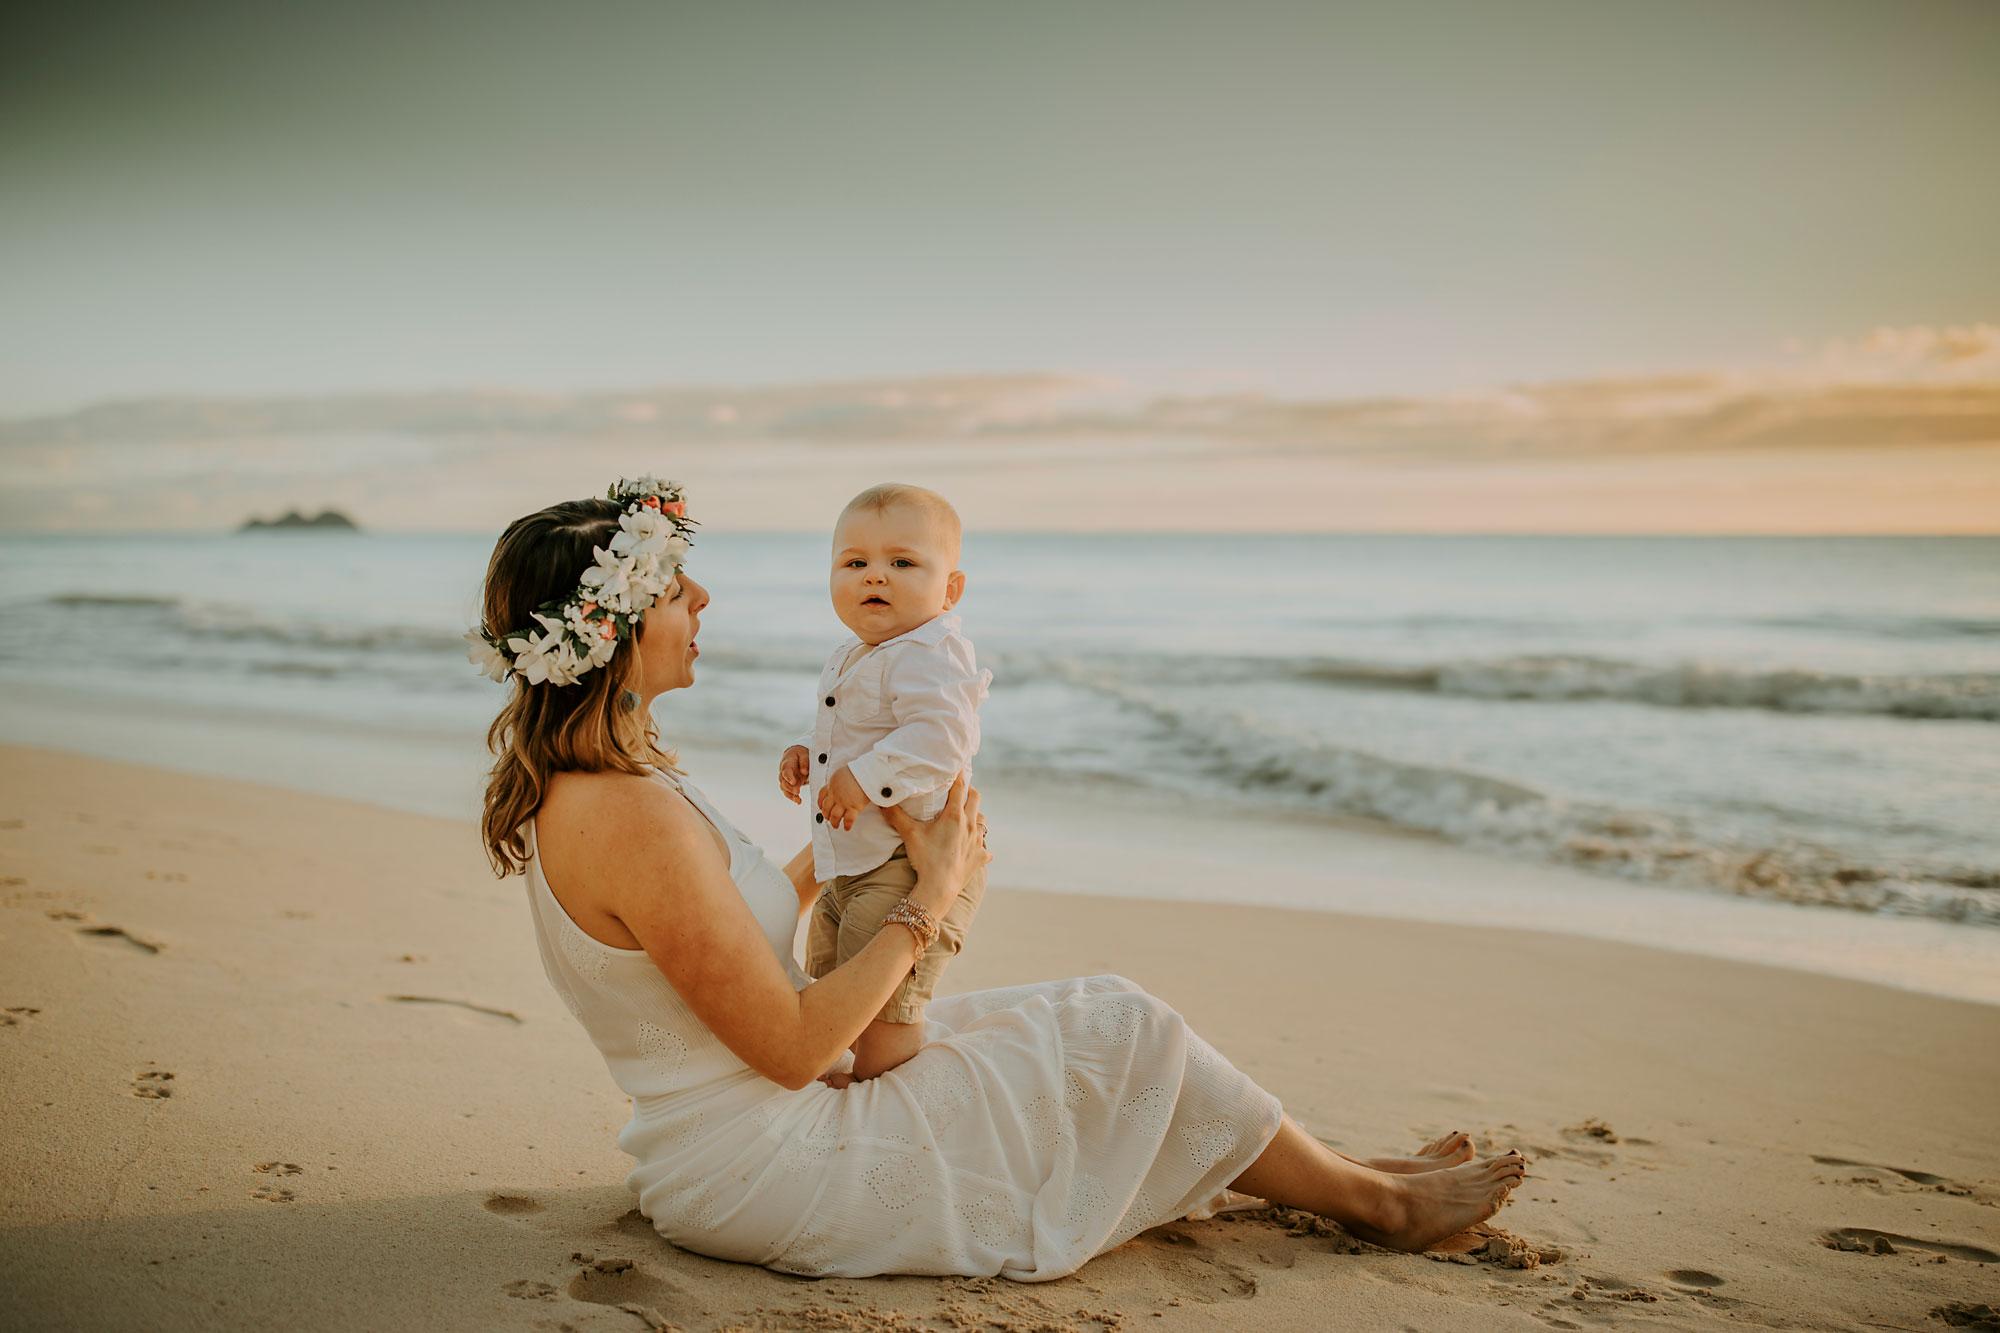 Hawaii-Oahu-Family-Photographer-10.jpg